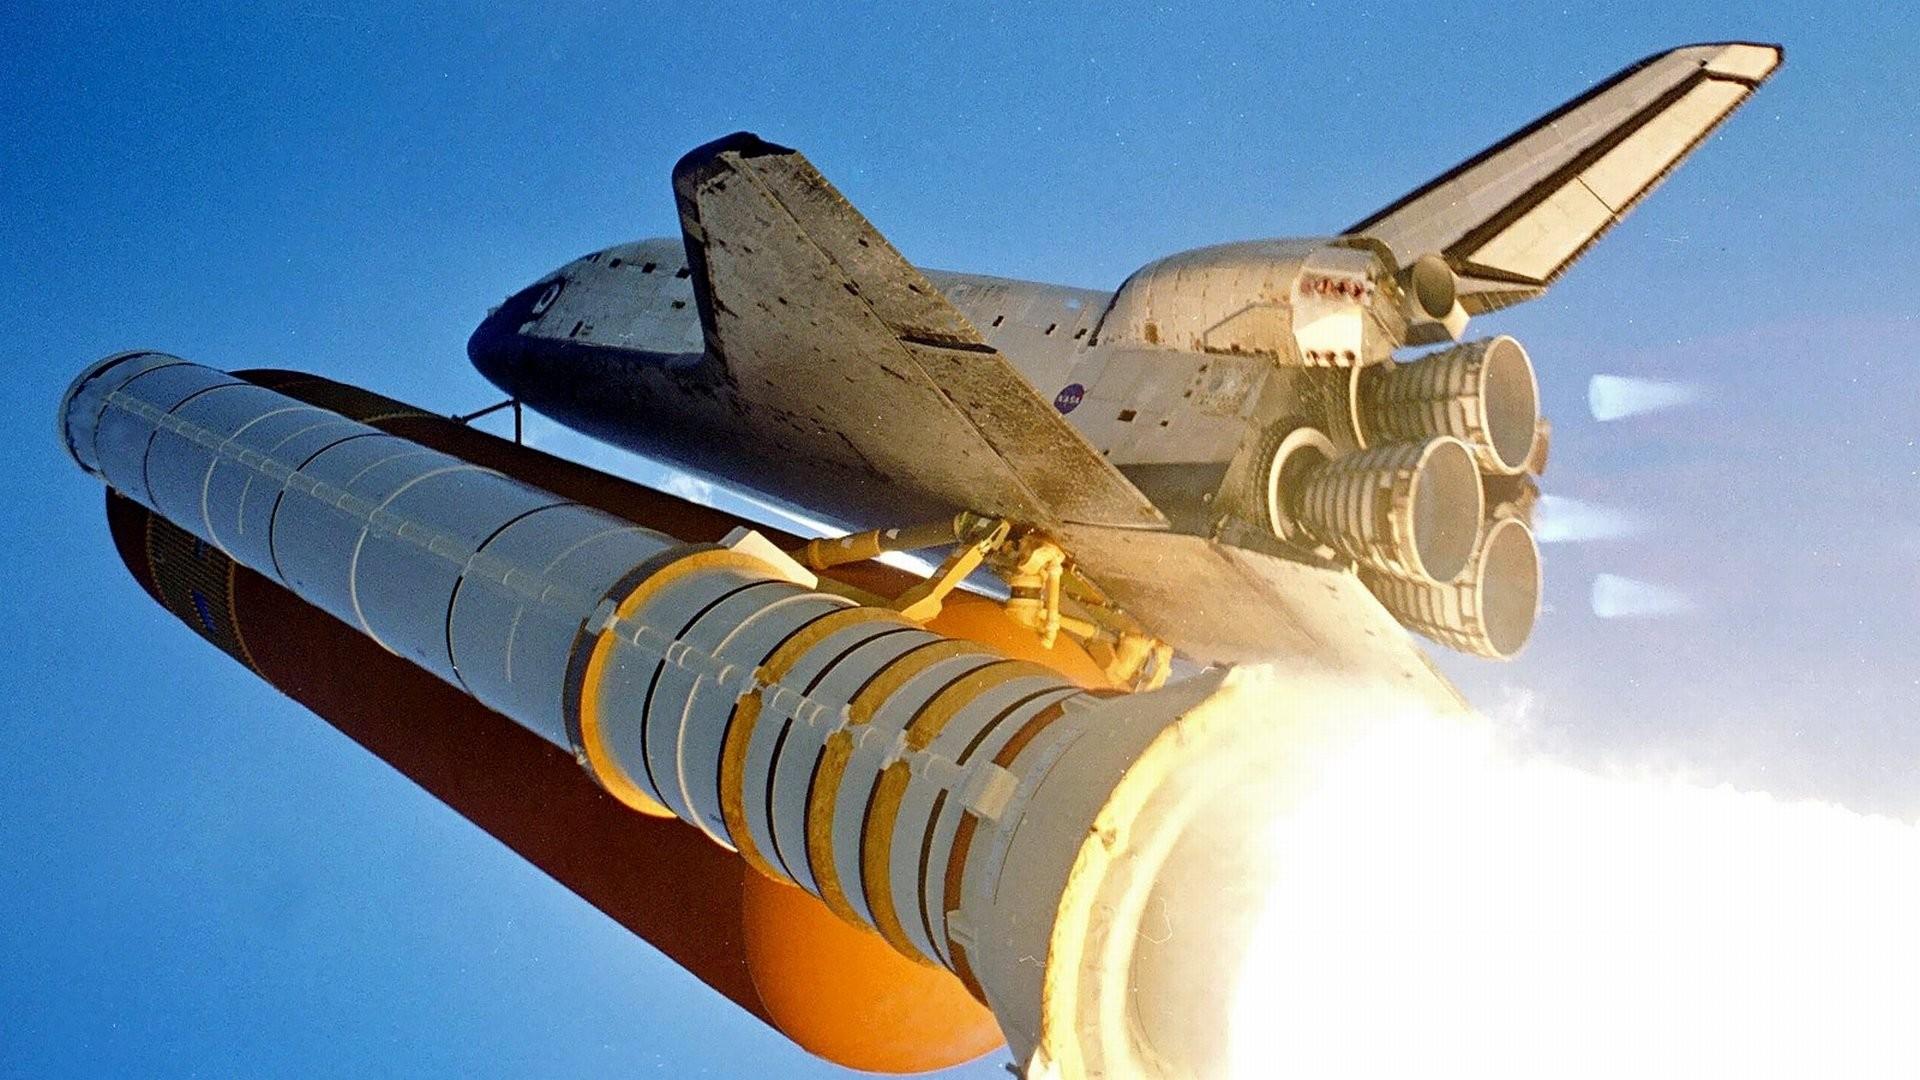 Hd Wallpaper - Space Shuttle Wallpapers Hd , HD Wallpaper & Backgrounds